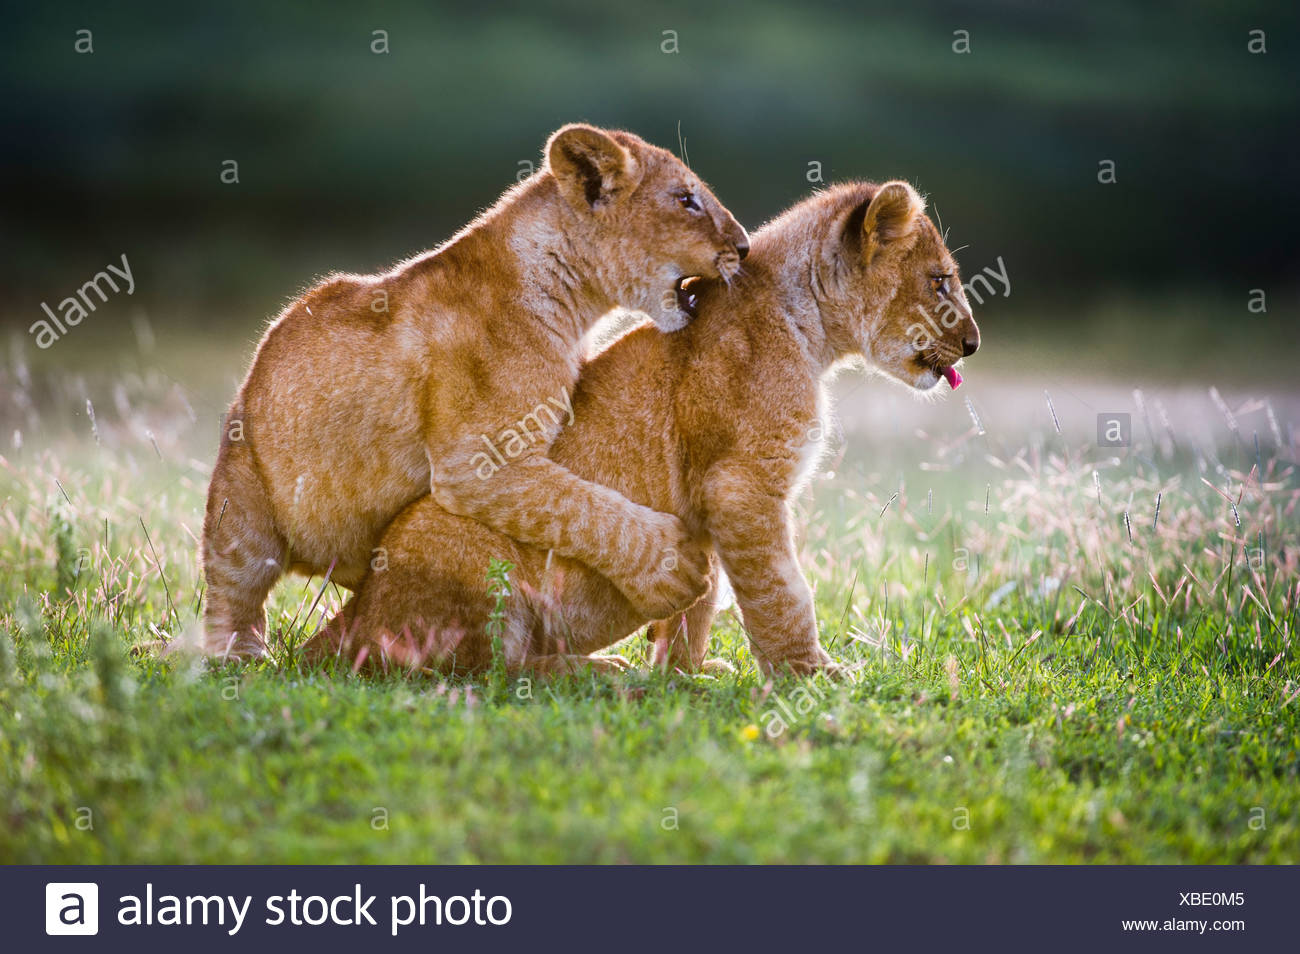 African Lion cubs circa 4 mese vecchio cub insieme giocando, grande palude, Serengeti Tanzania Immagini Stock